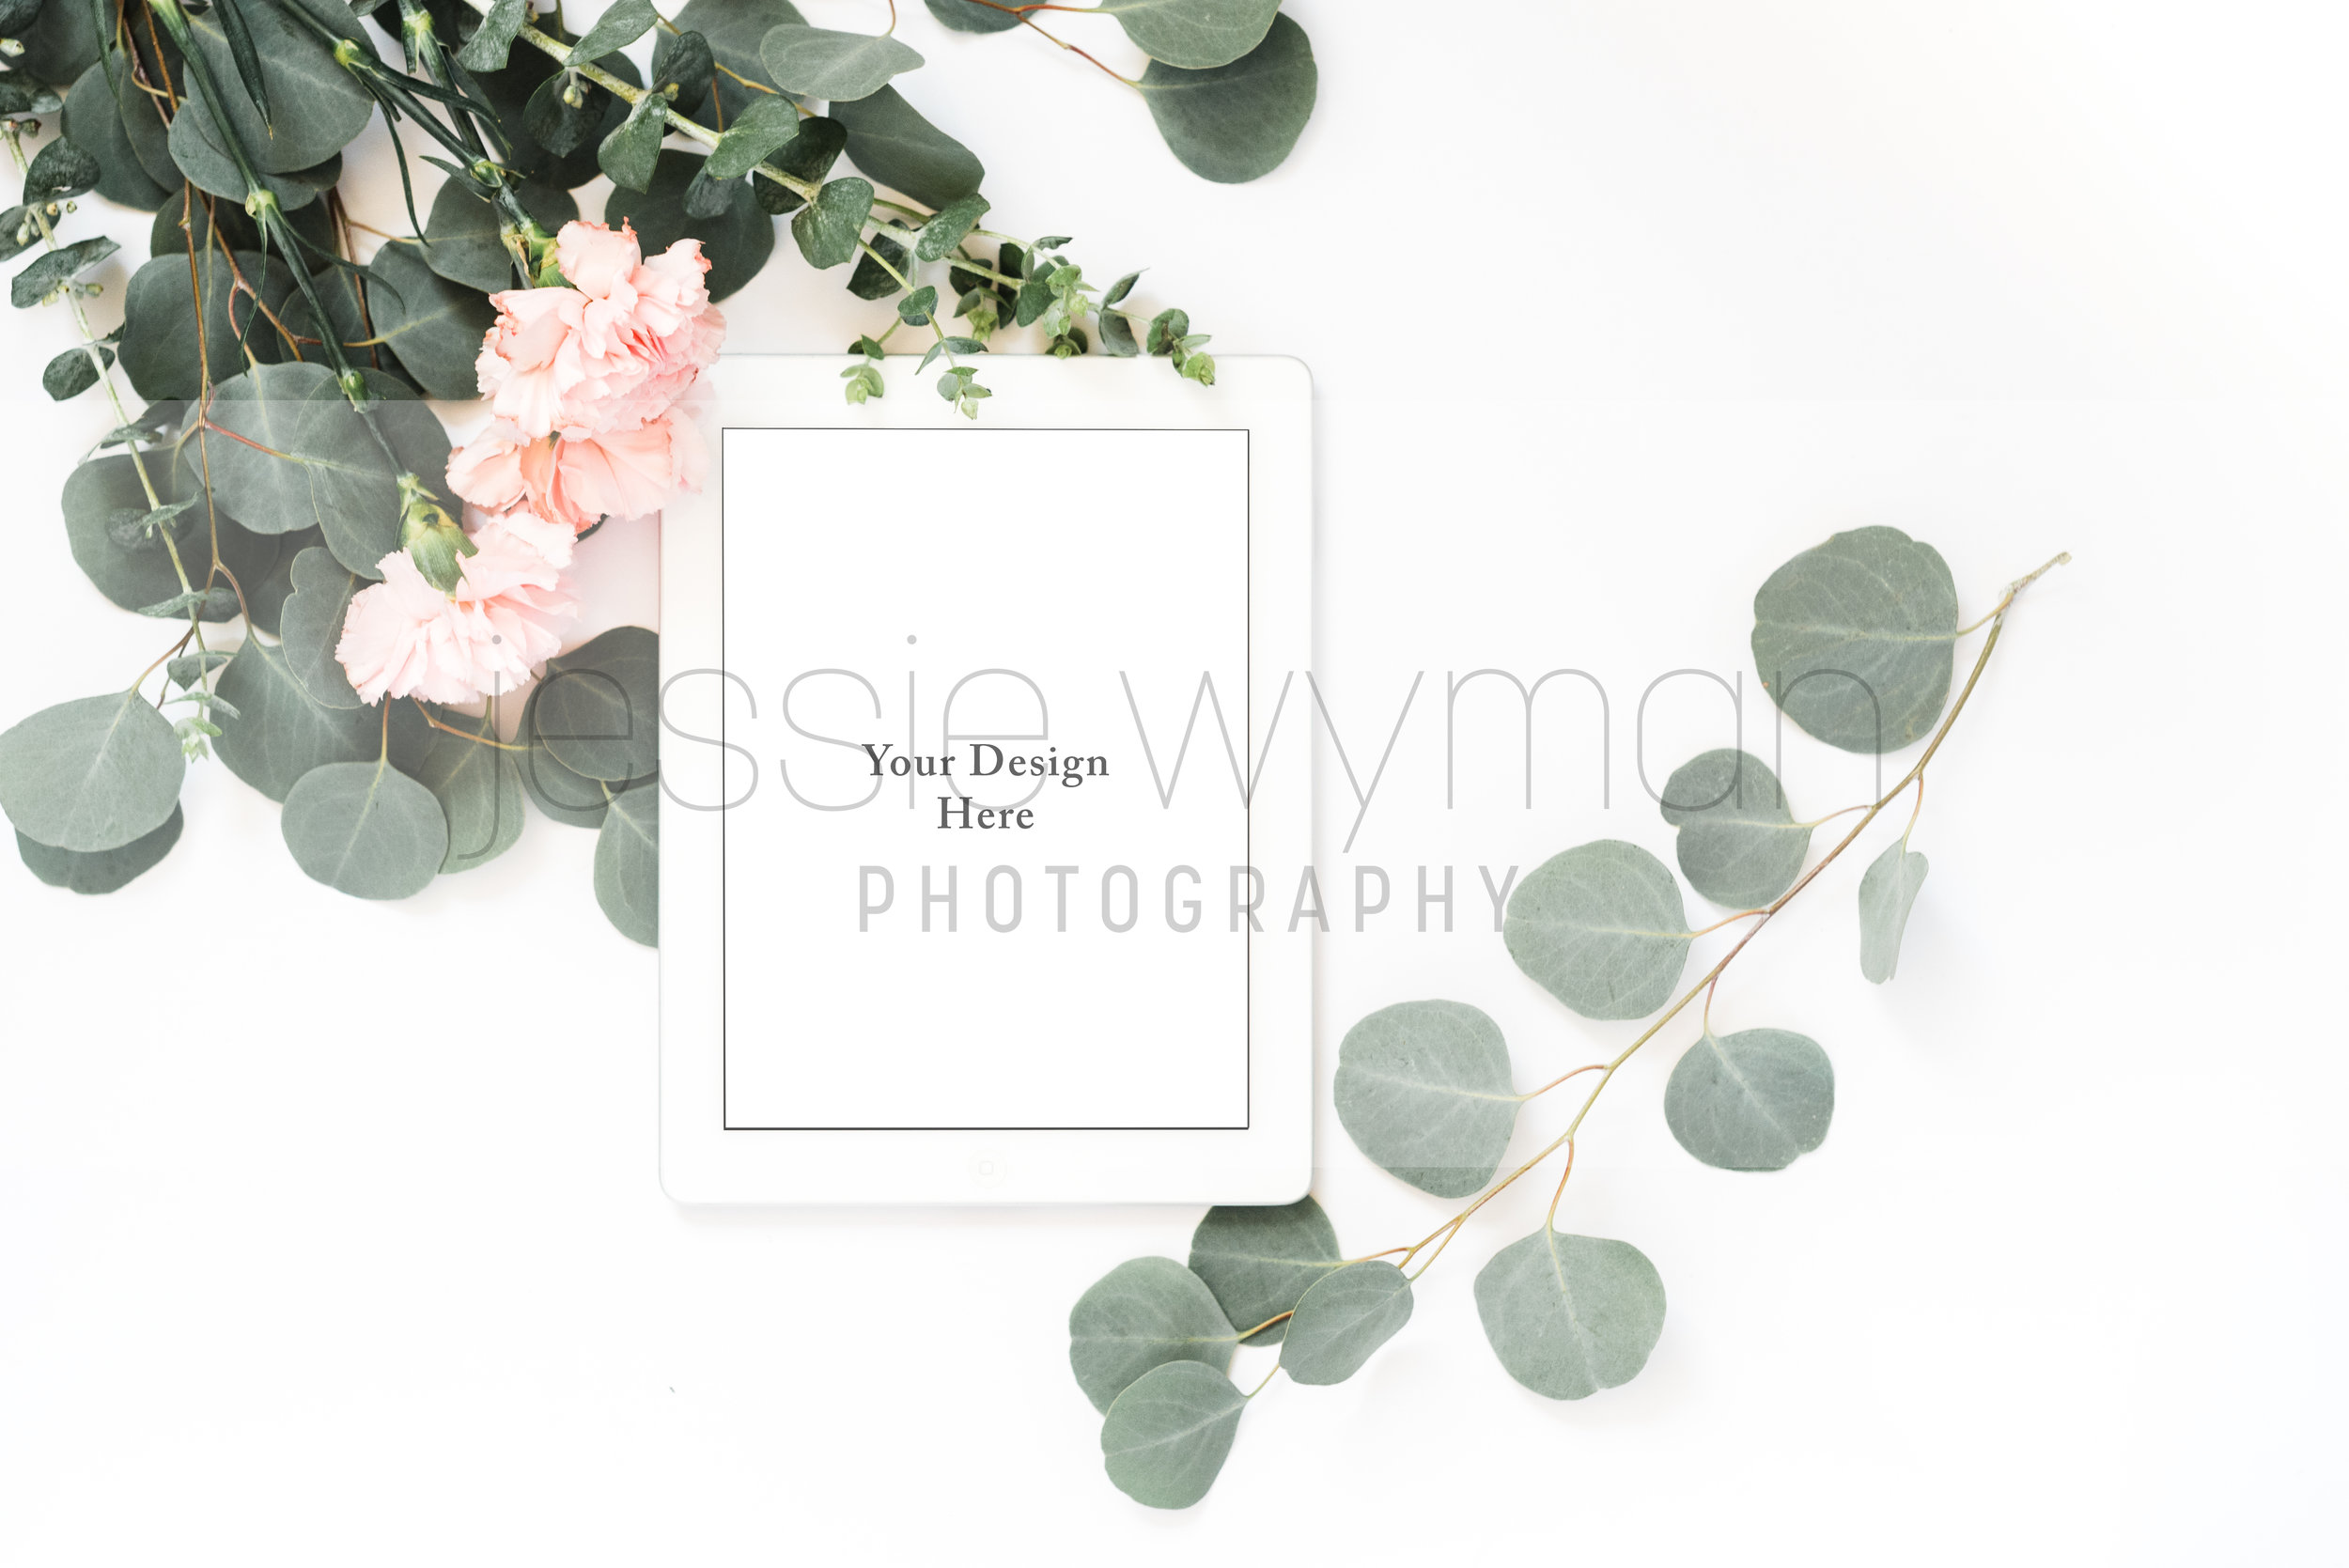 Floral Ipad Mockup_03_Cover.jpg